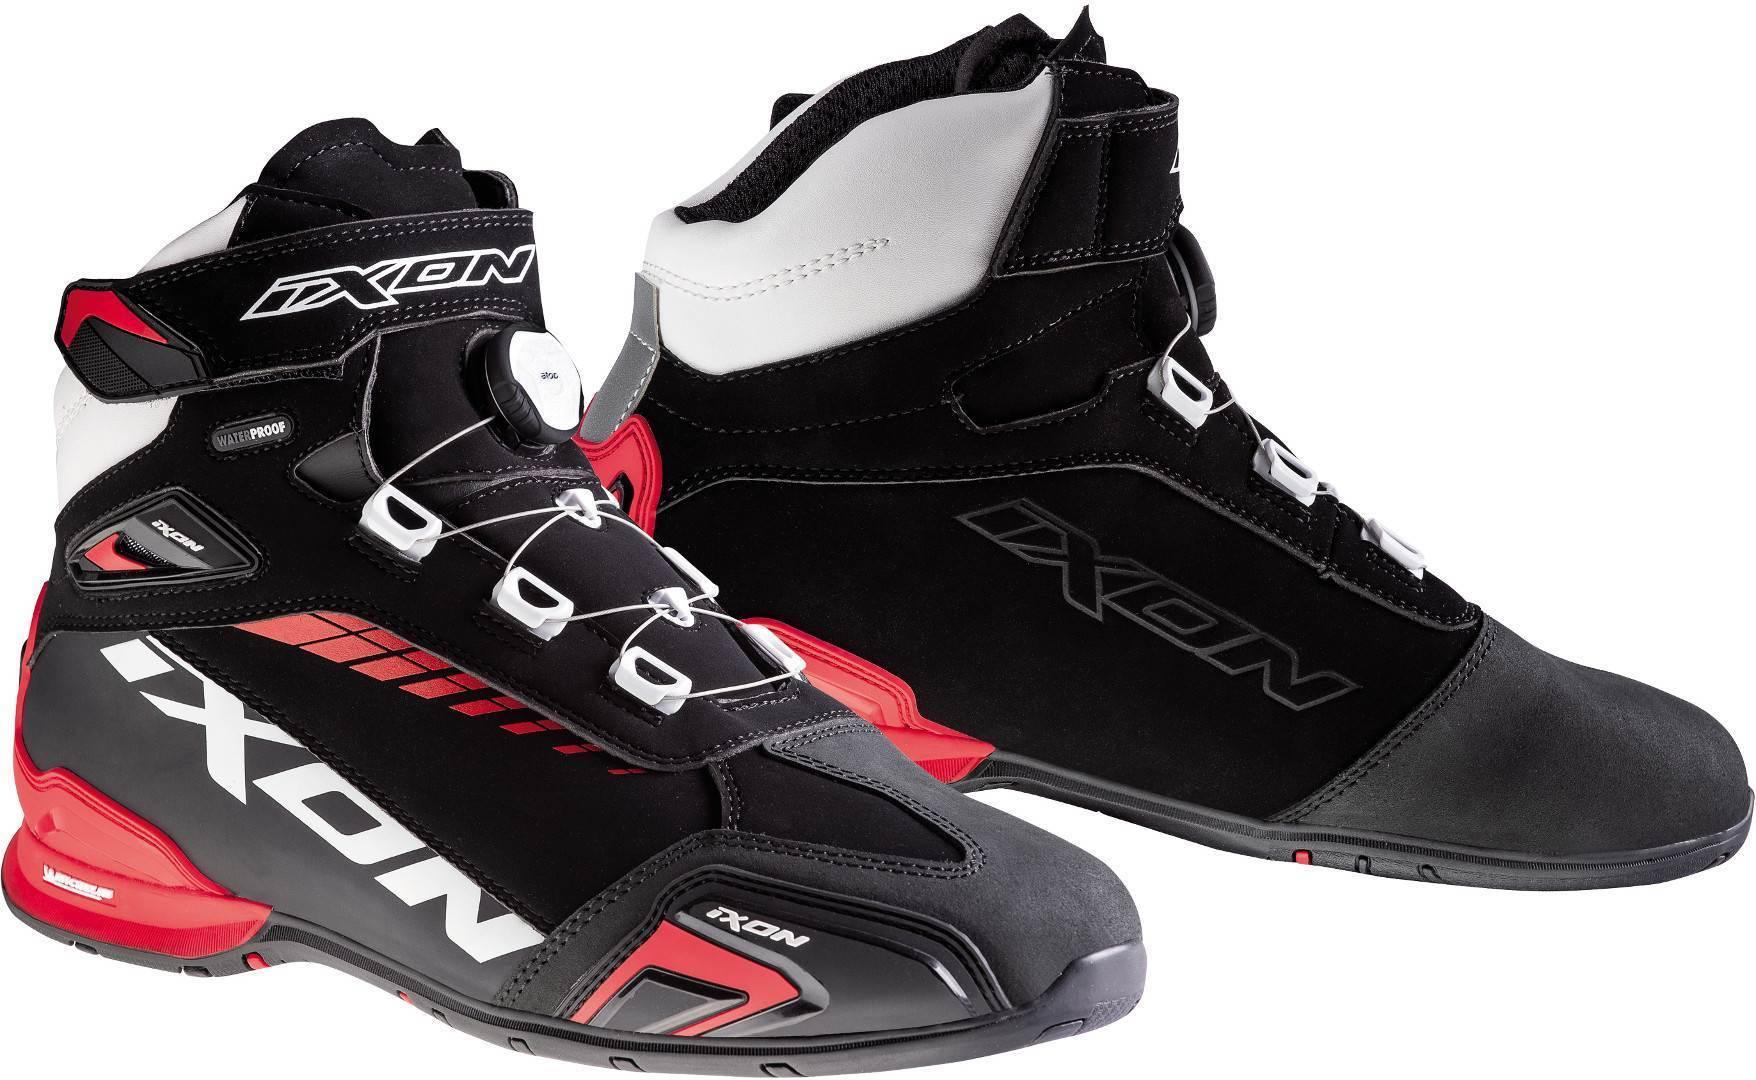 Ixon Bull WP Motorradschuhe, schwarz-weiss-rot, Größe 46, schwarz-weiss-rot, Größe 46